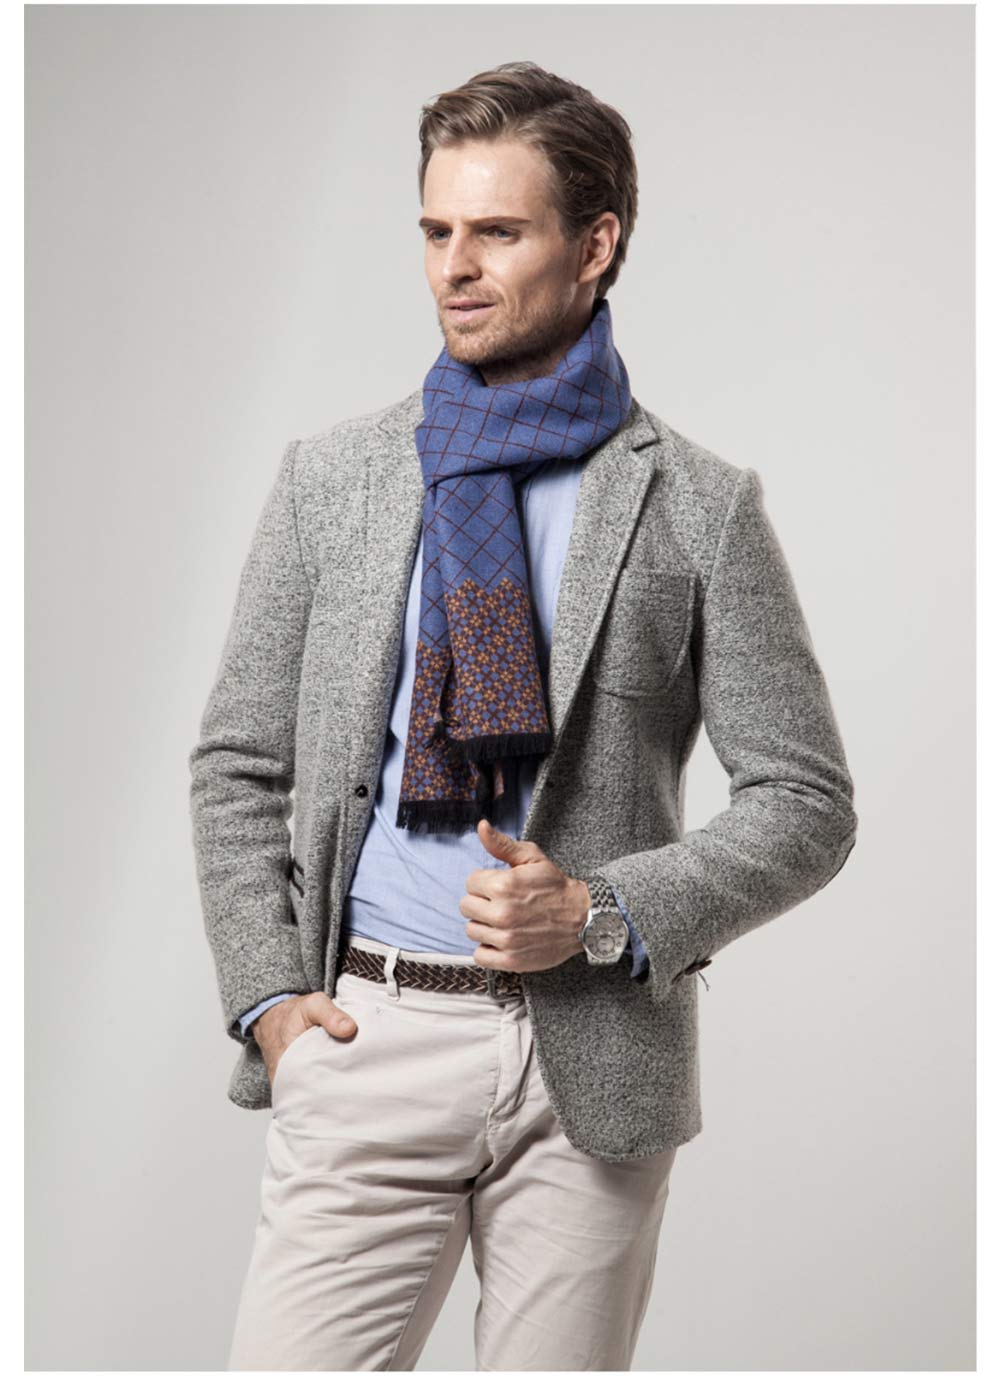 British Style Plaid Scarf for Men, Business Man, Gentleman, Unique Imitation Cashmere Plaid scarf, 2019 Brand New Men's Scarf 13